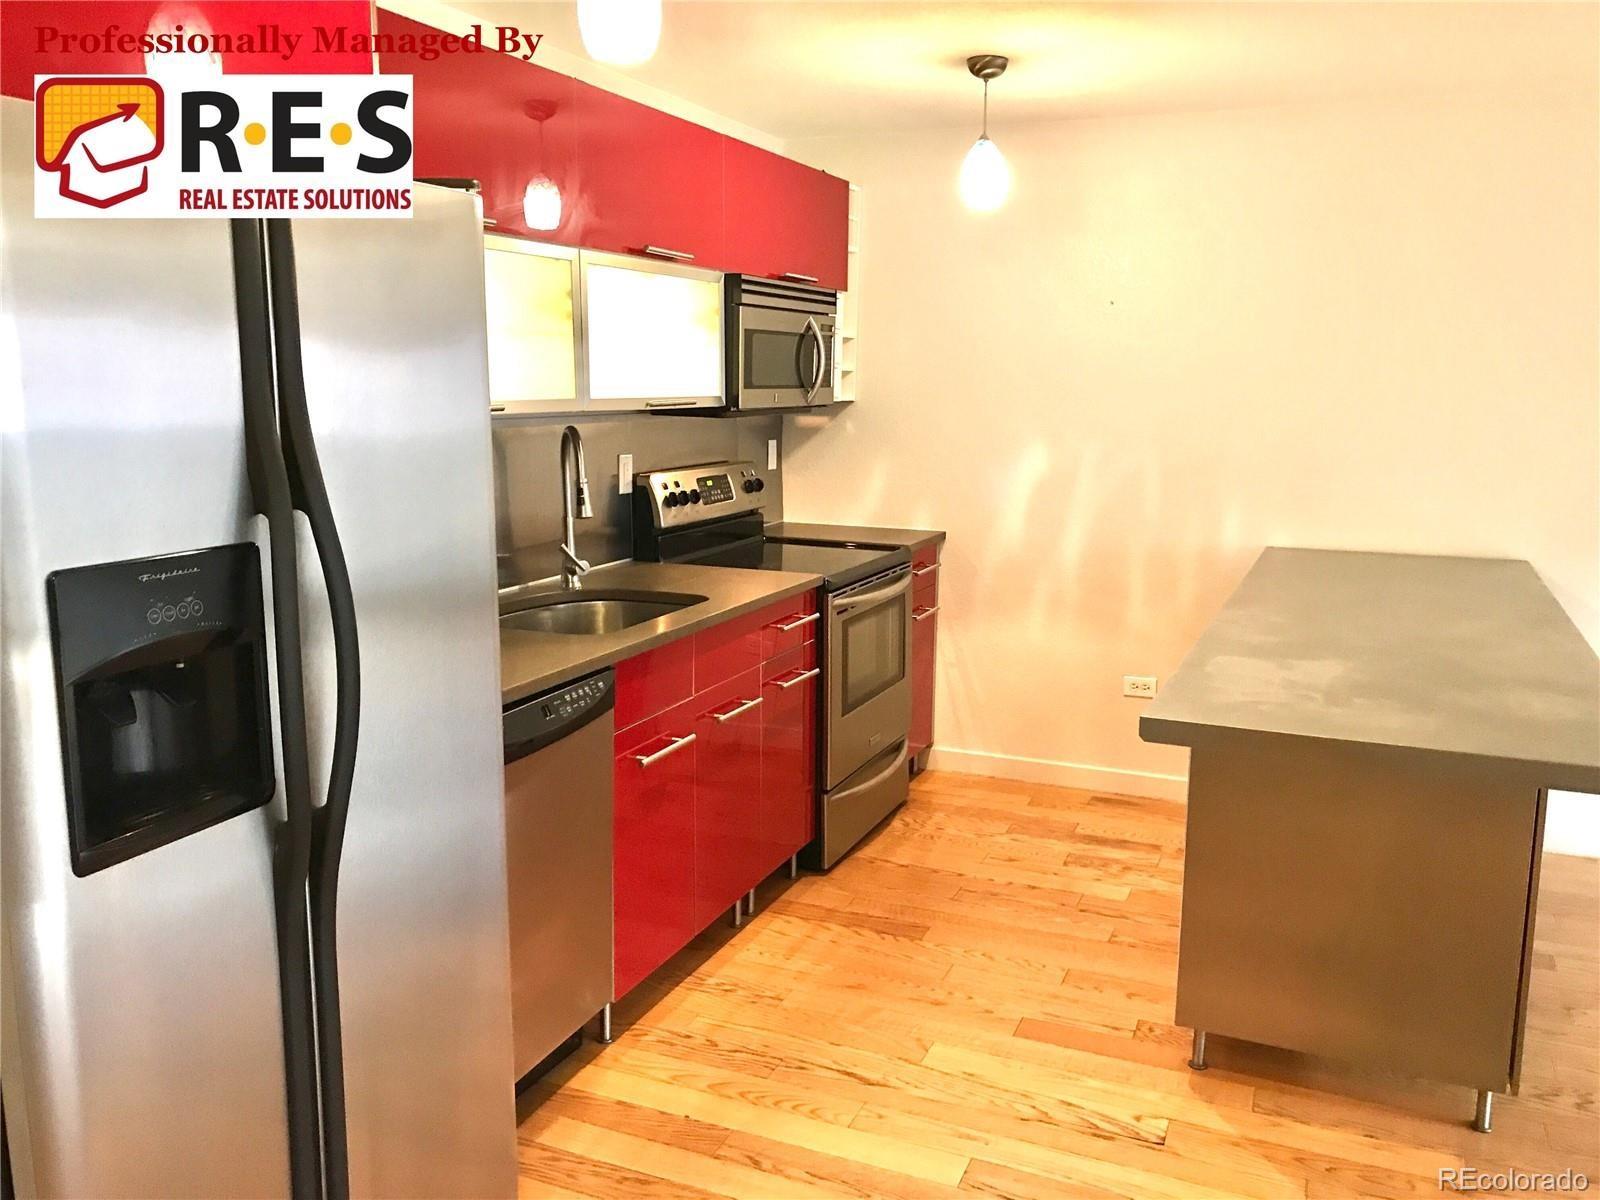 MLS# 9817838 - 4 - 75 N Emerson Street #103, Denver, CO 80218